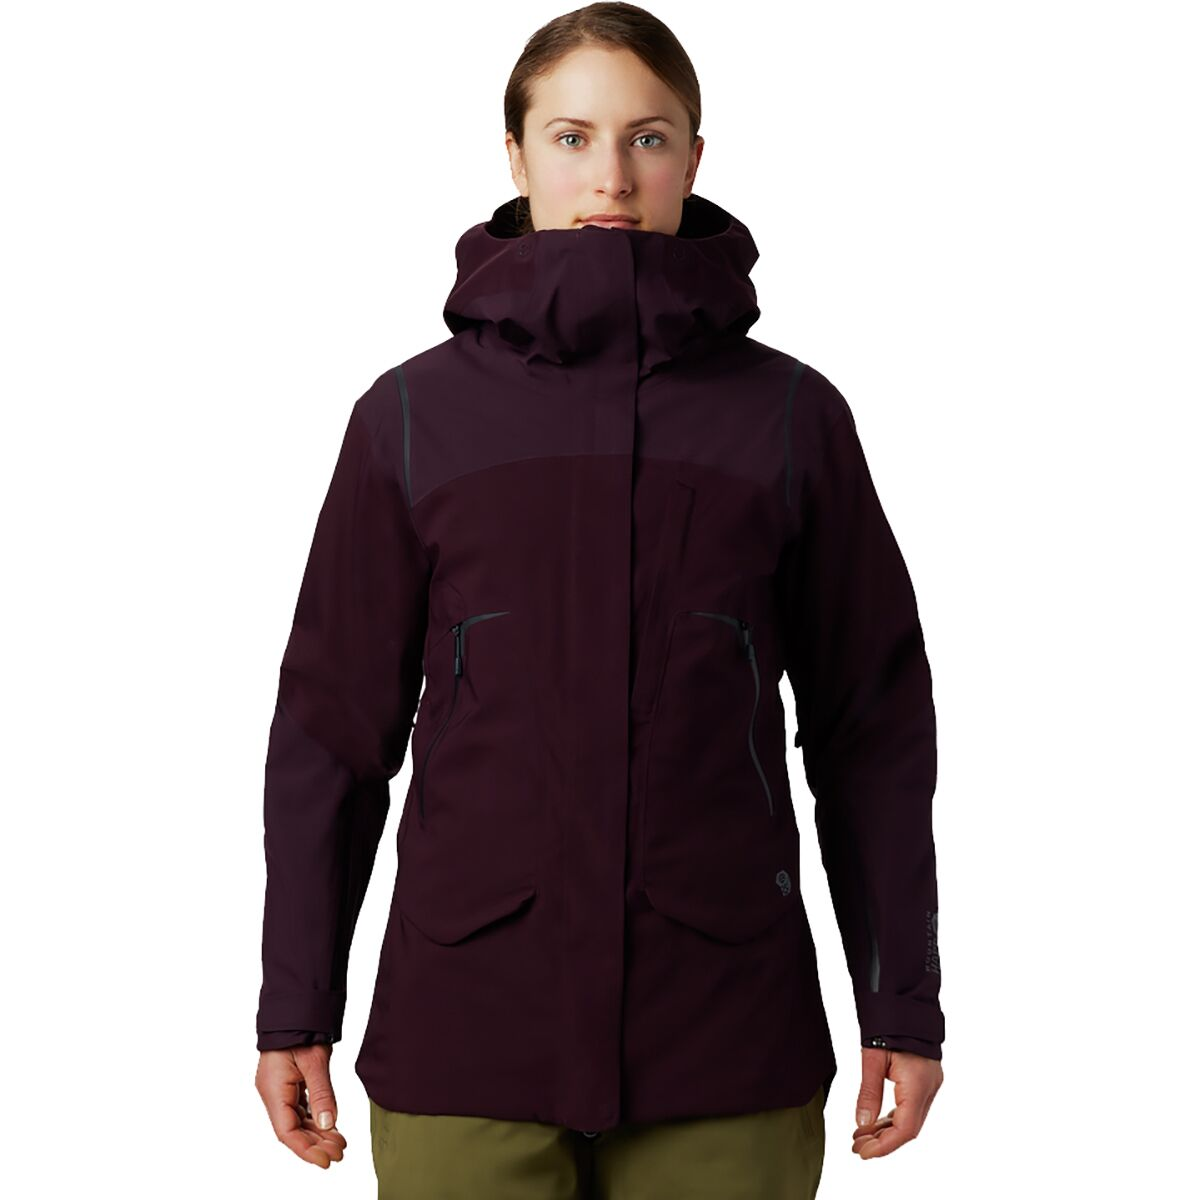 Boundary Line GTX Insulated Jacket - Women